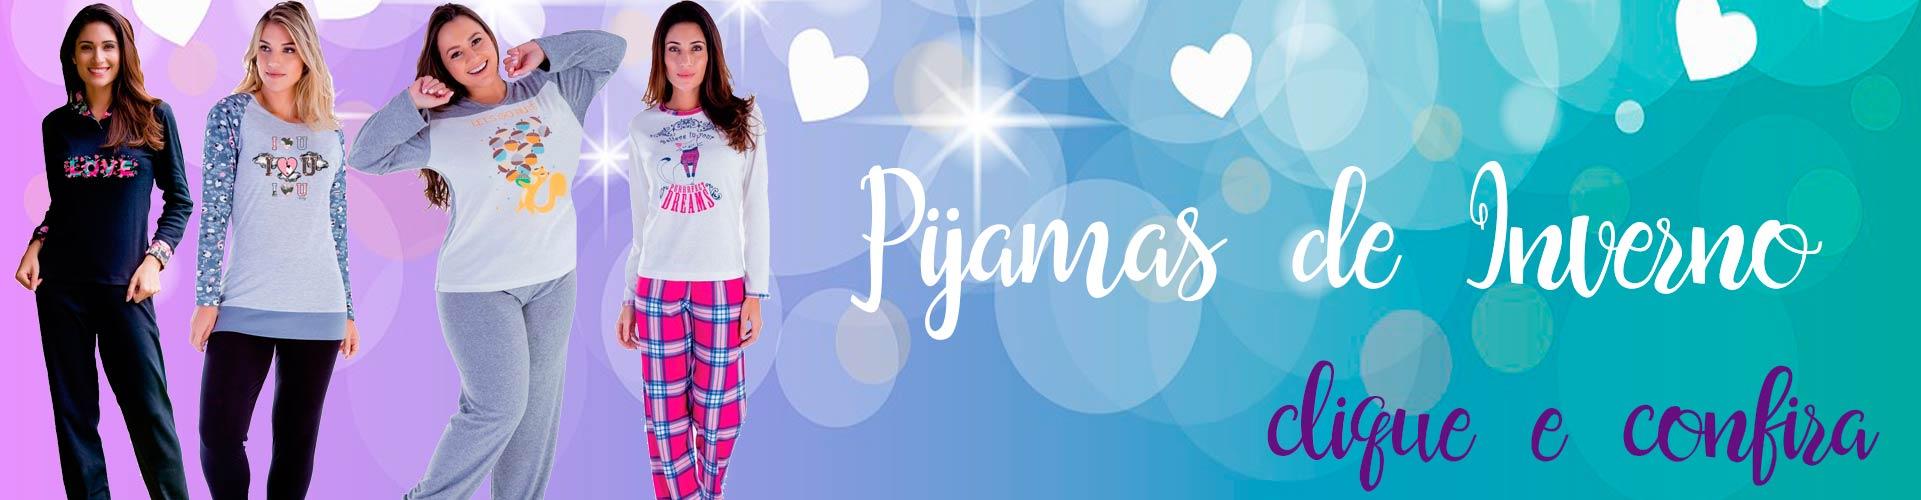 pijamas de inverno